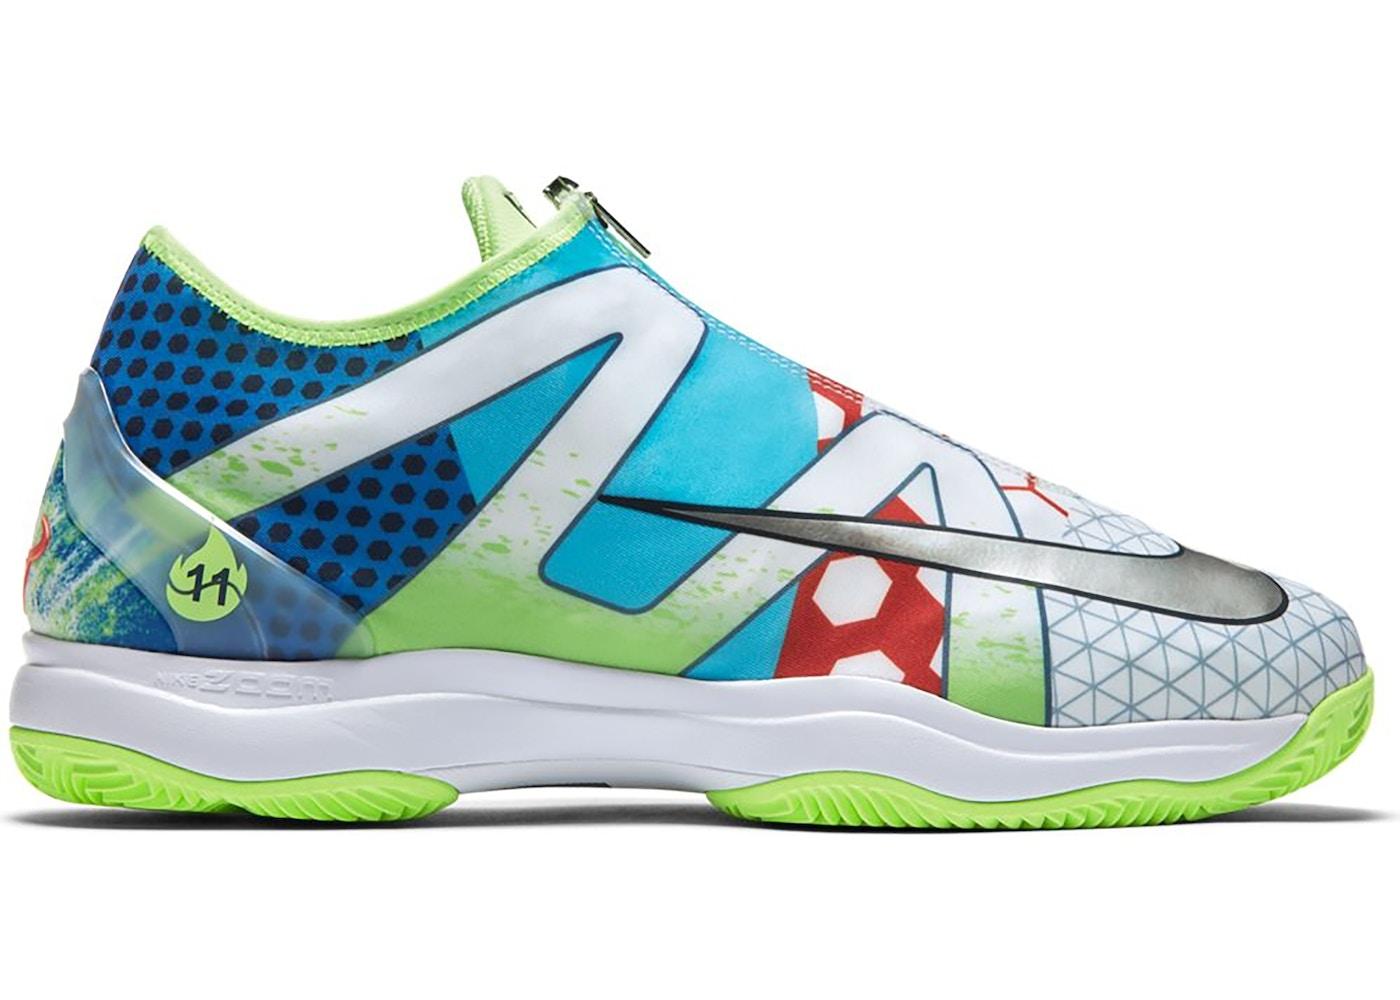 Nike Air Zoom Cage 3 Glove Rafael Nadal Roland Garros